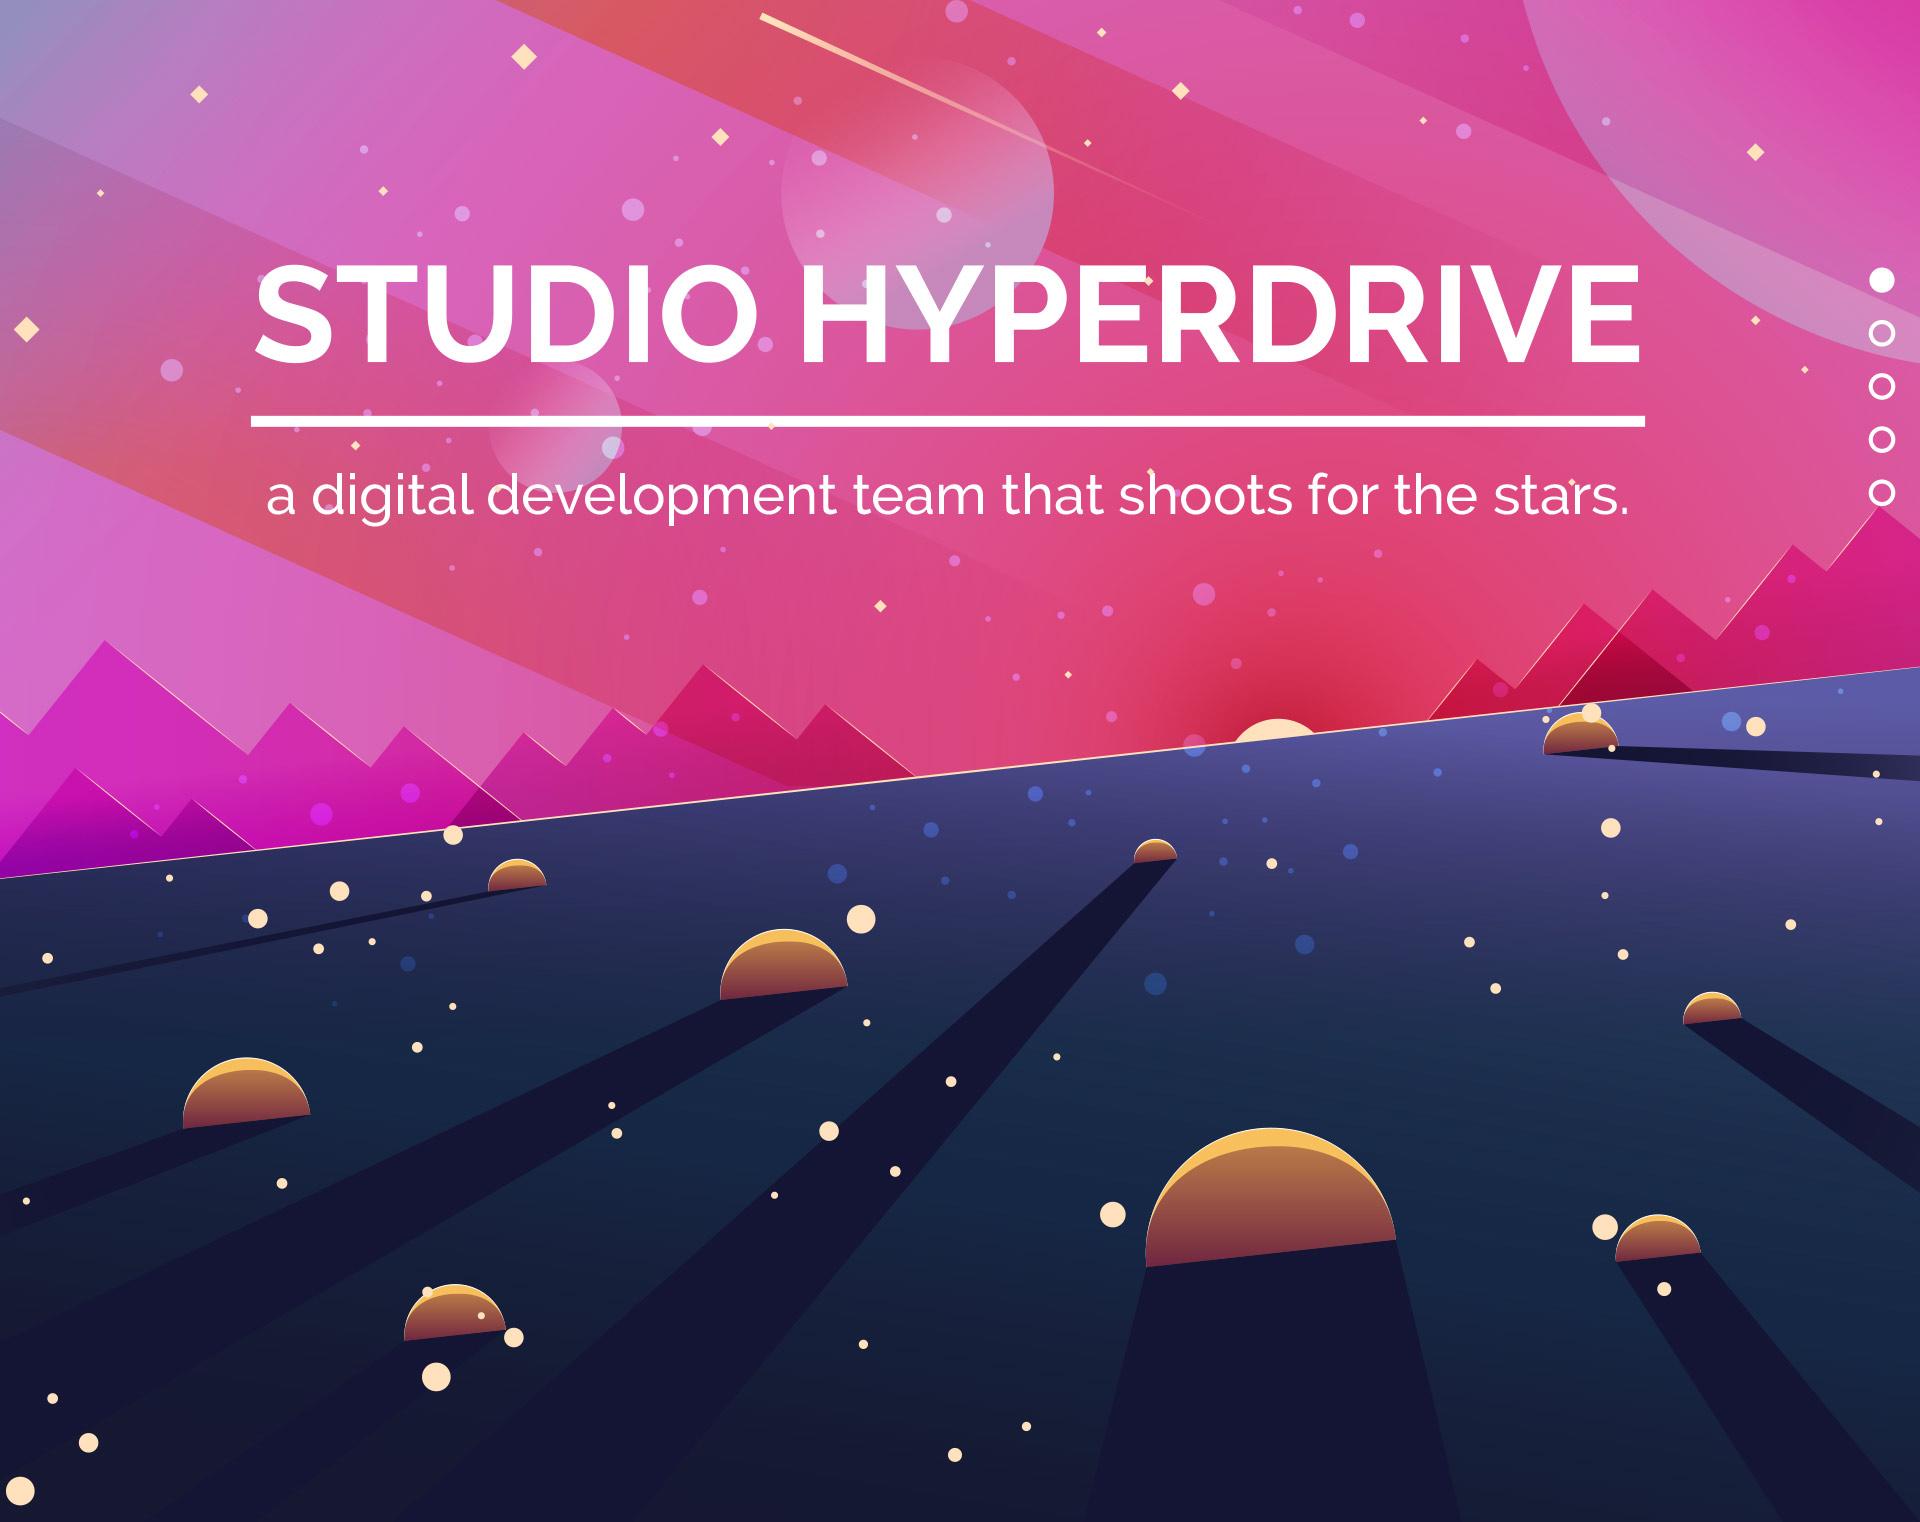 Studio-Hyperdrive-1.jpg